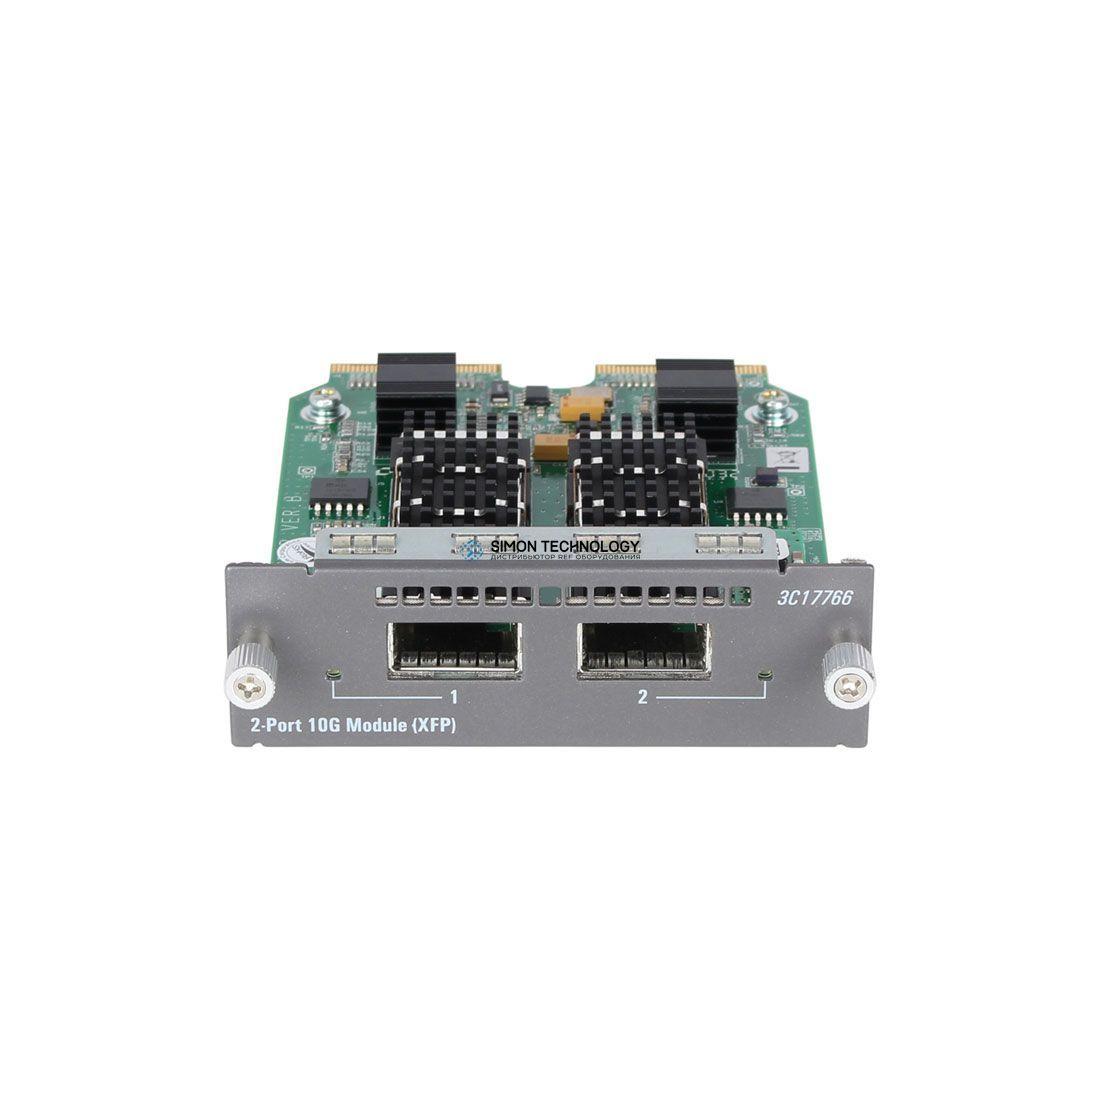 Модуль HP HPE 4500/4800 2-port 10GbE XFP Module (3C17766)